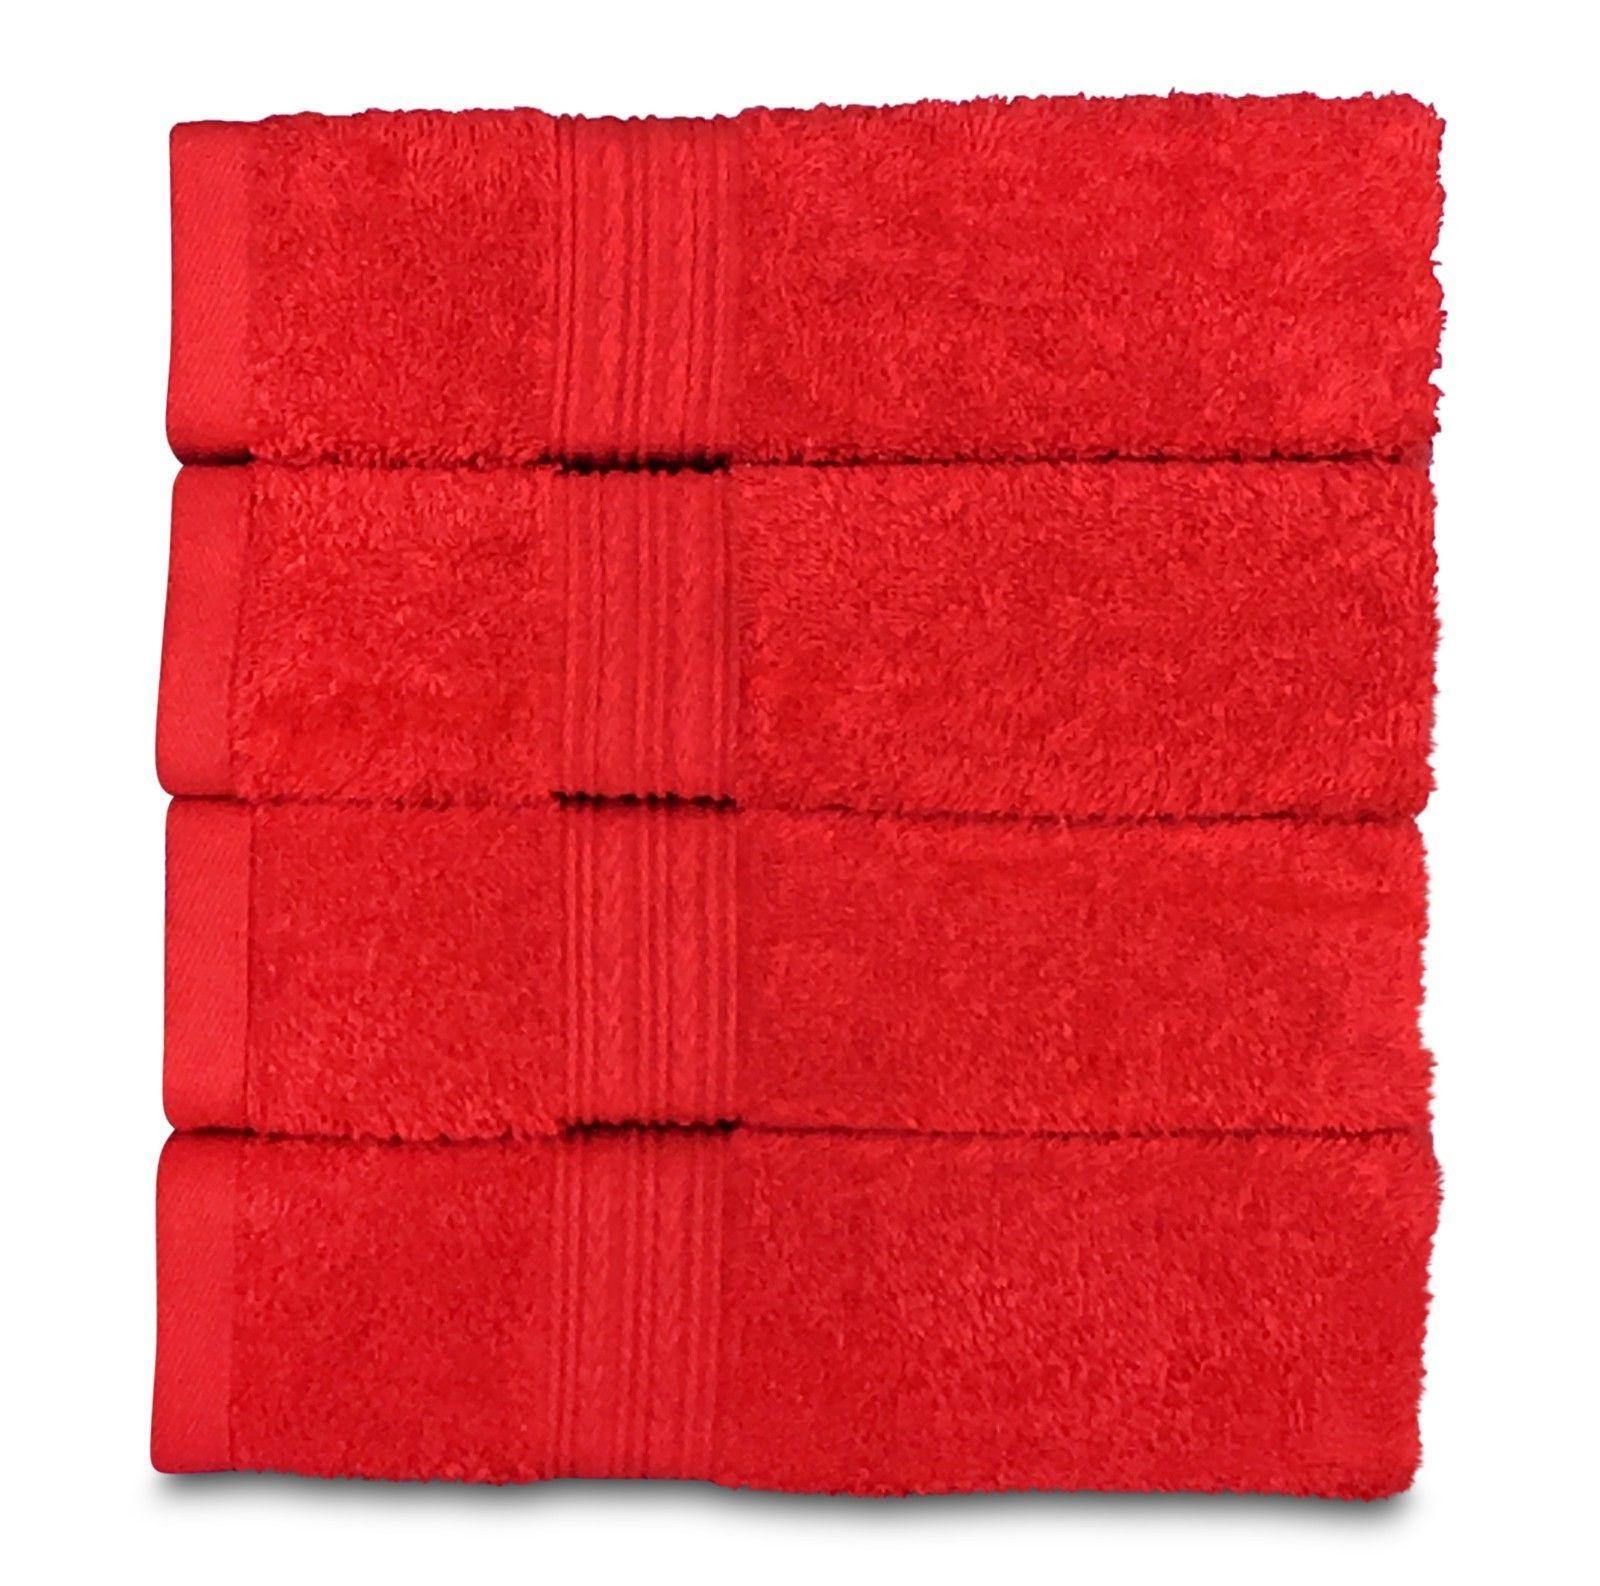 Goza %100 Hand Towels, Bath, Gym, Towels 4 Pack